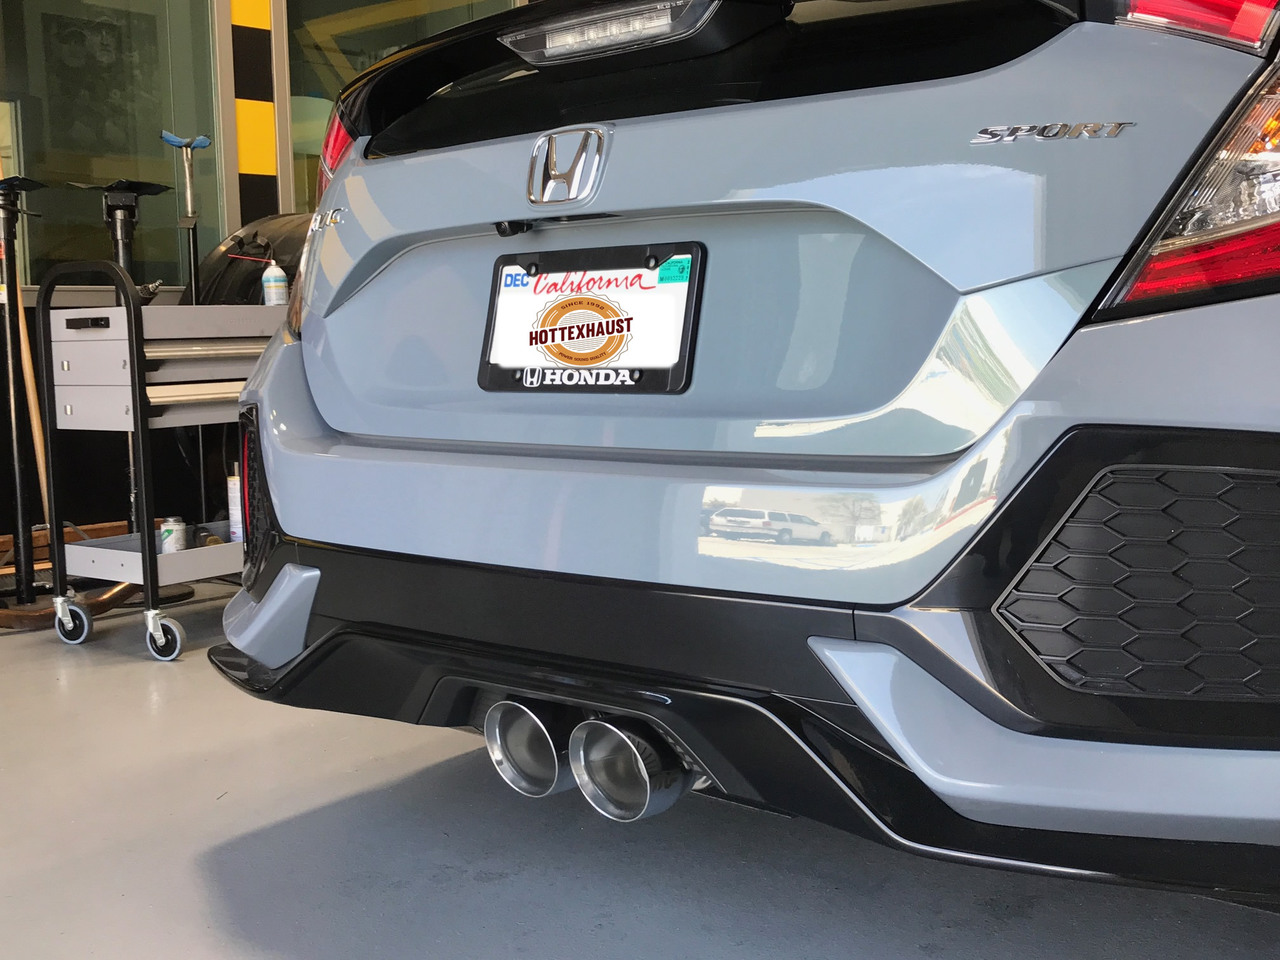 magnaflow 19373s honda civic hatchback sport 1 5l dual center exit stainless cat back performance exhaust system